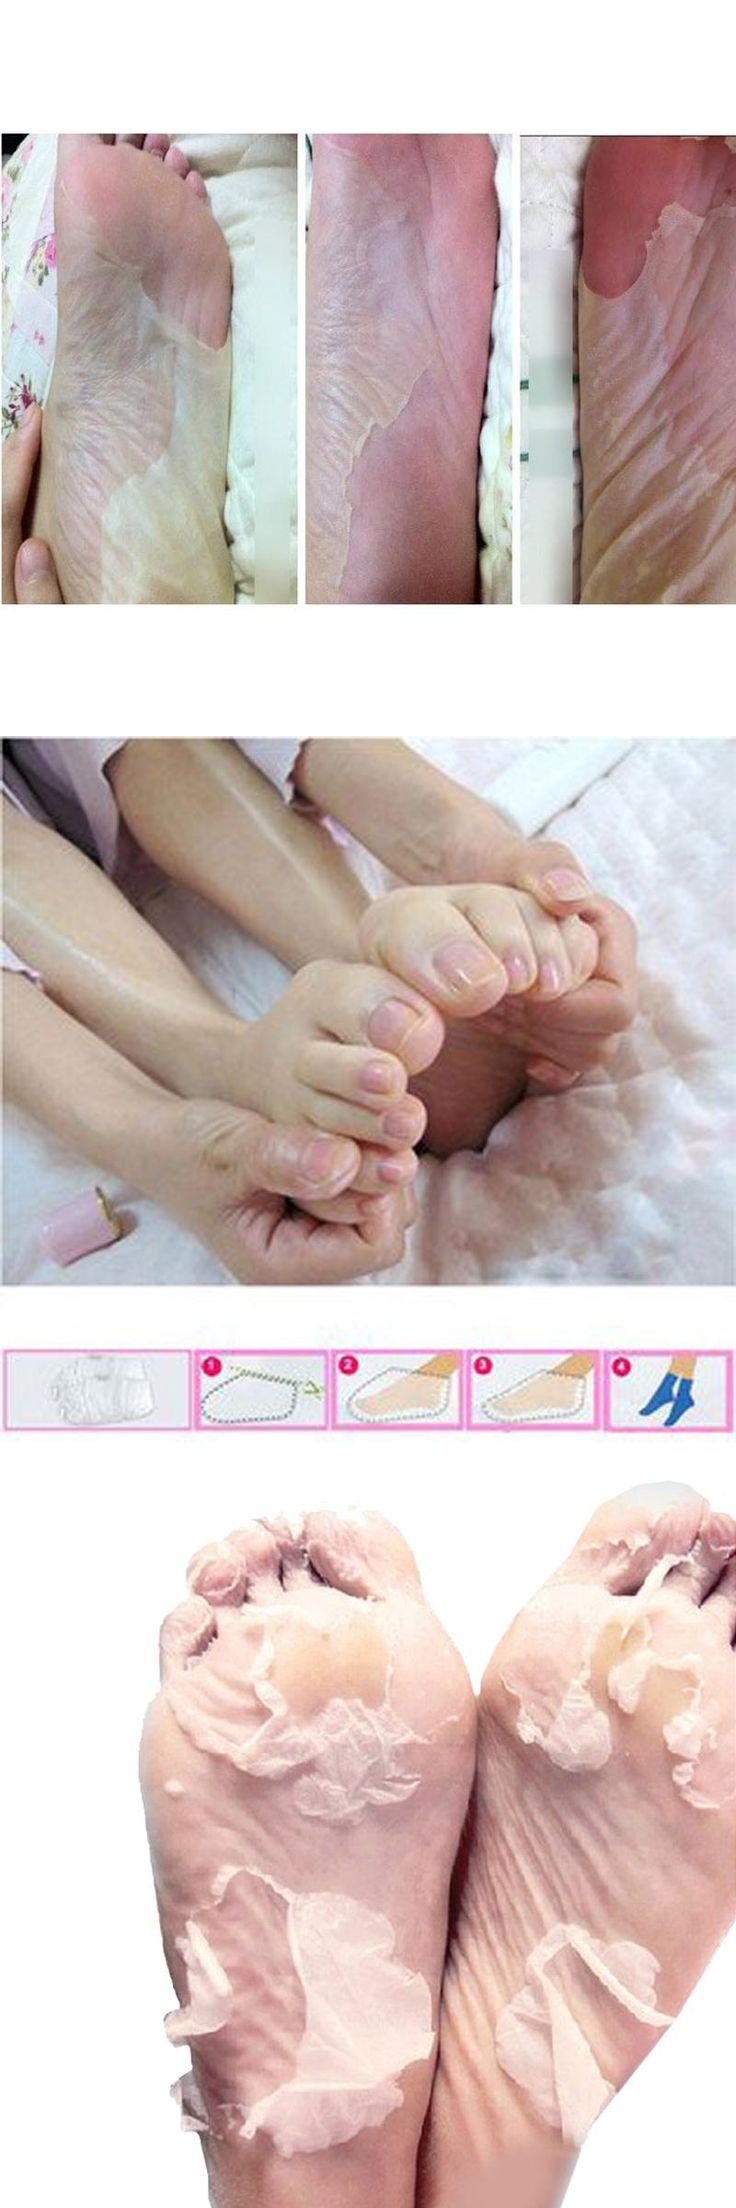 [Visit to Buy] 5Pair=10Pcs Baby Feet Skin Smooth Exfoliating Foot Mask Foot Care Mask Foot Care Health Care Pedicure Socks Sosu Peeling Foot #Advertisement